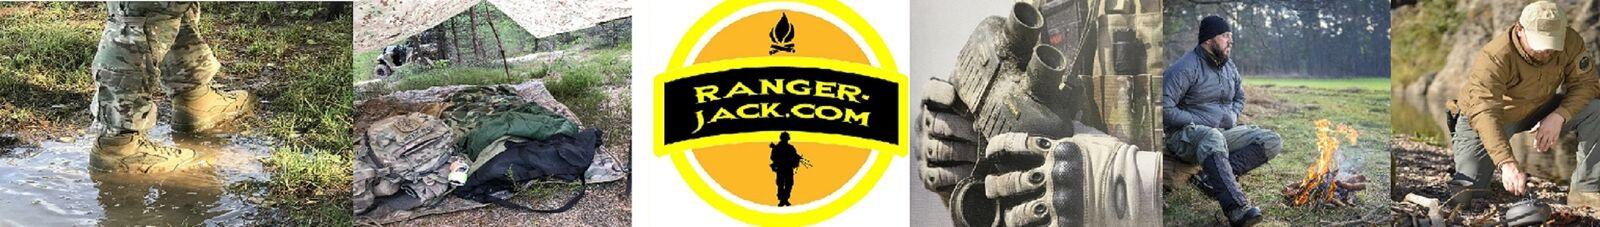 Ranger-Jack-com